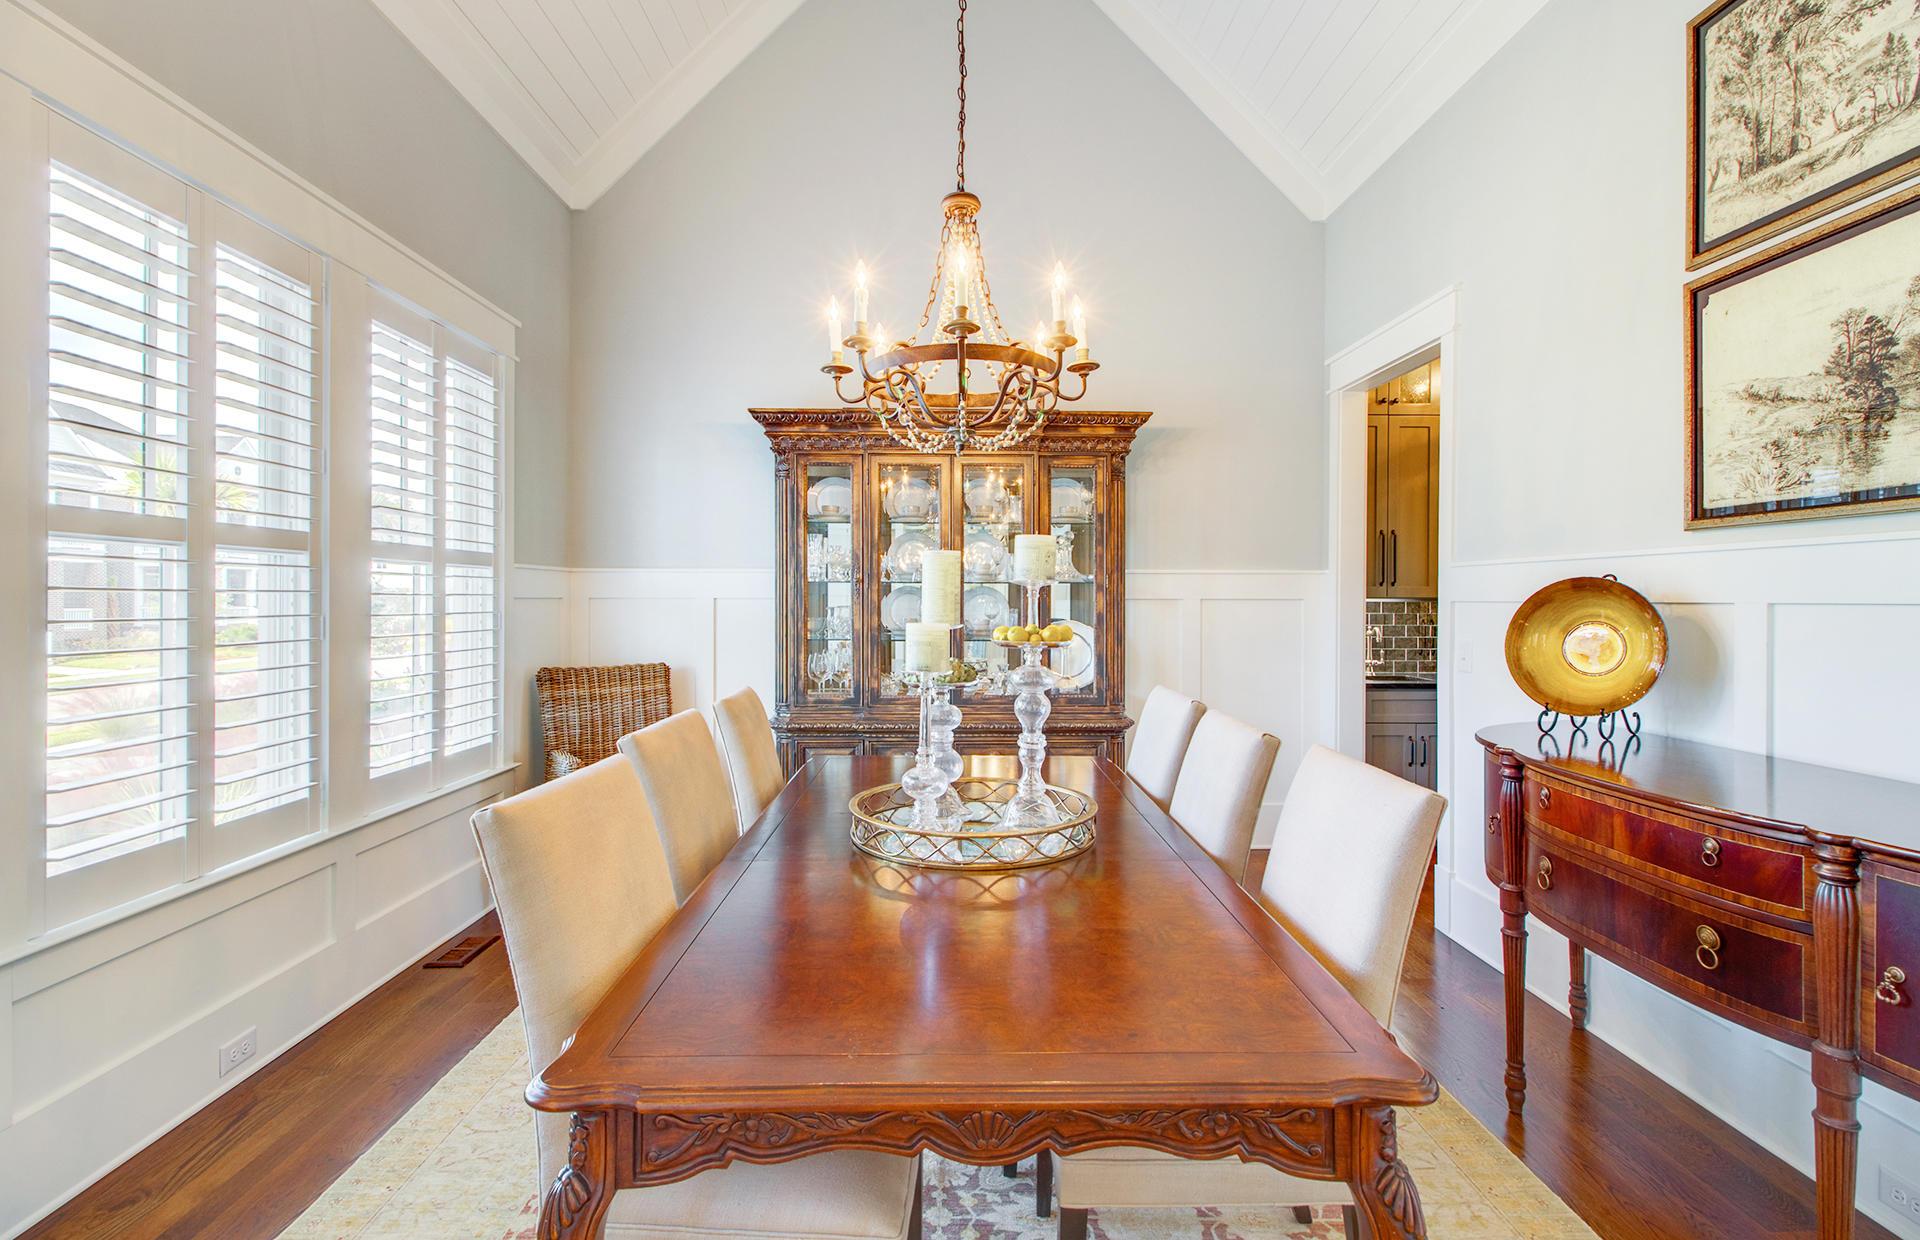 Daniel Island Park Homes For Sale - 117 Brailsford, Charleston, SC - 13